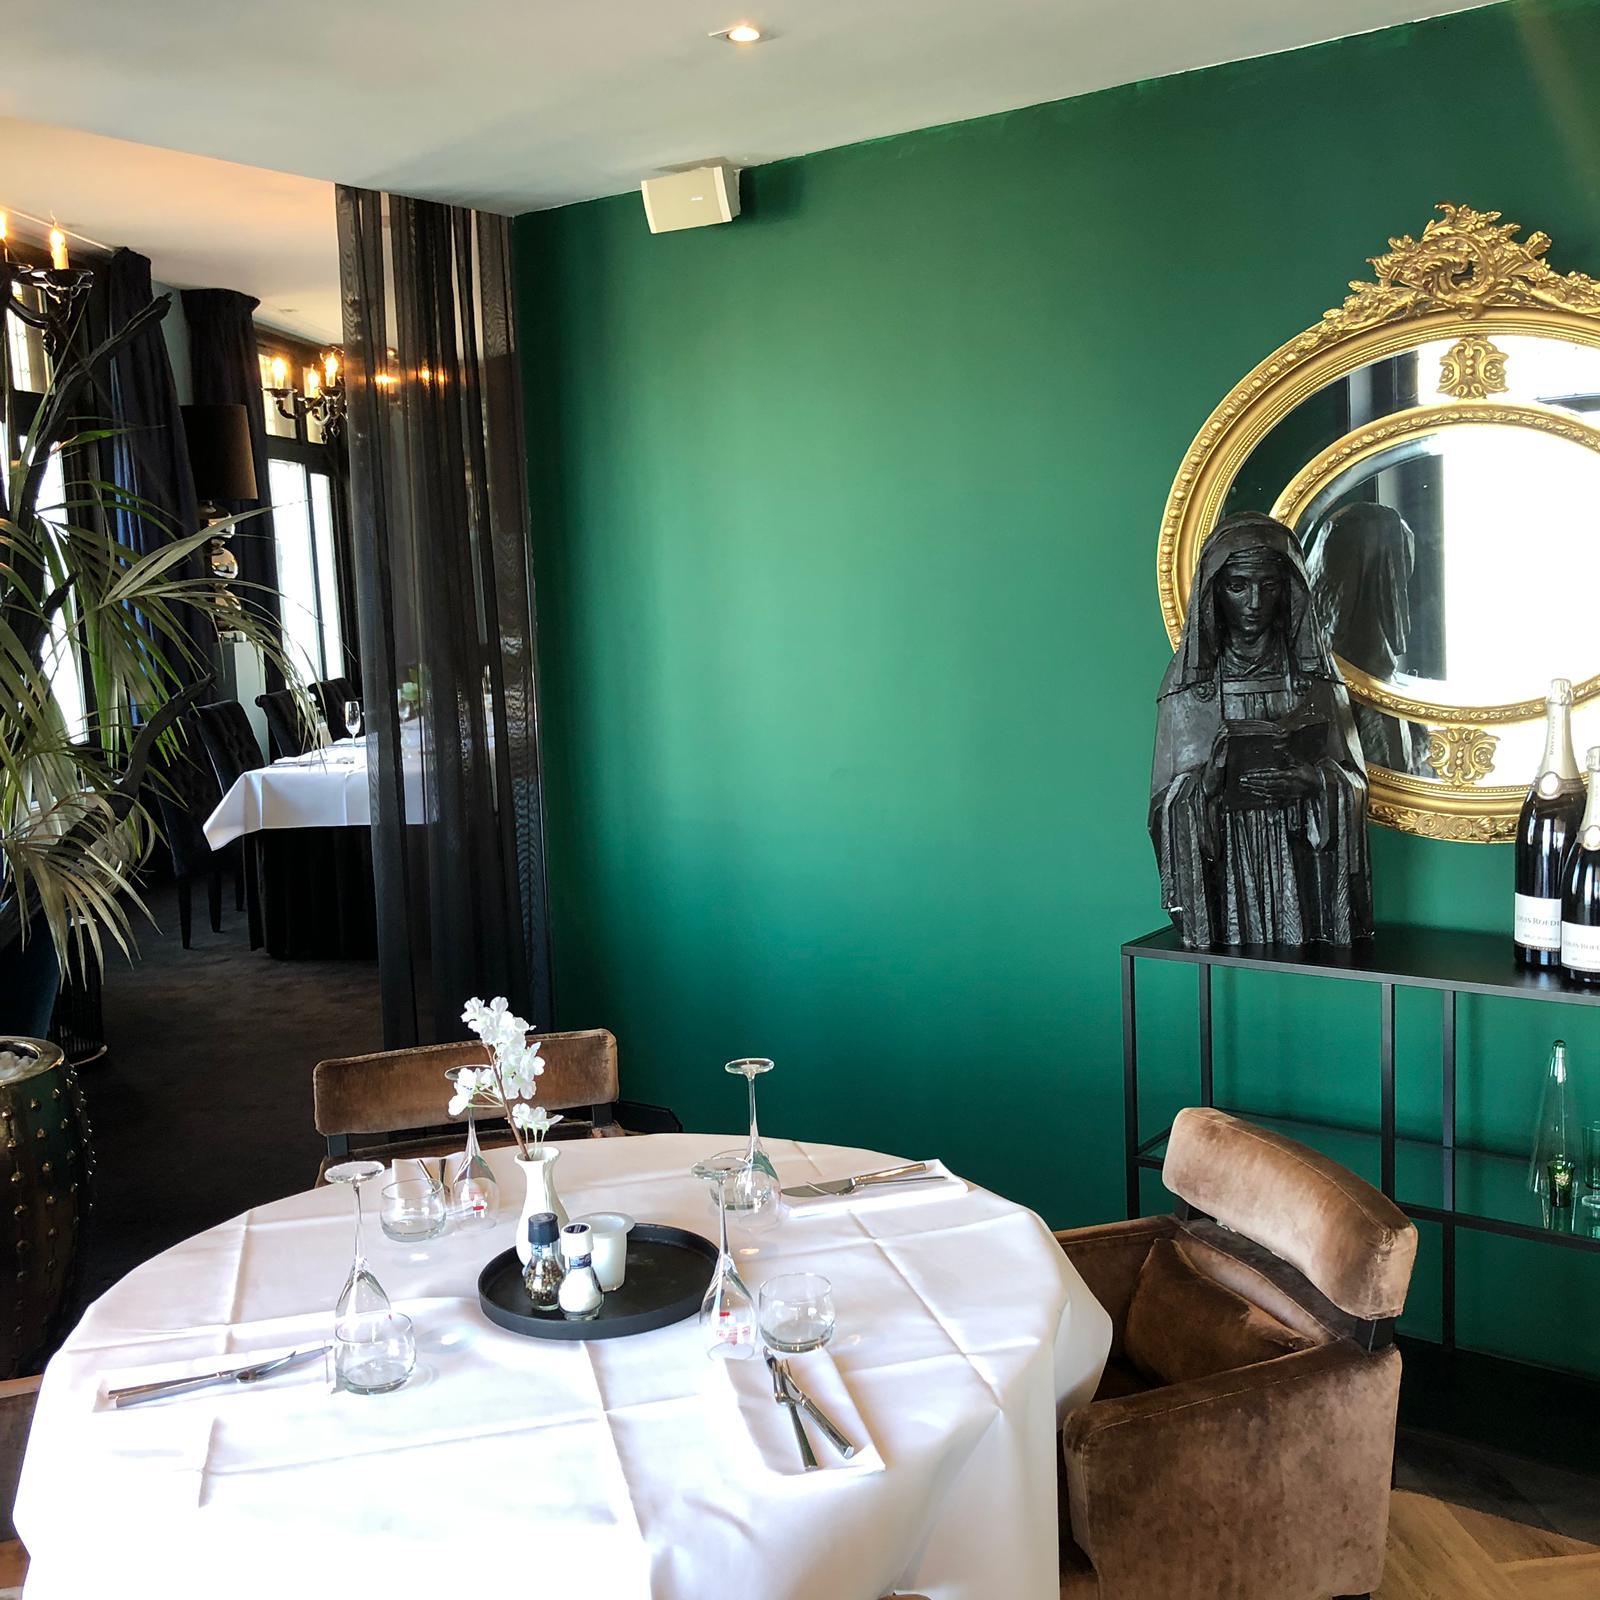 Inkoop Interieur Accessoires.Restro Bellevue Opent Na Restyling Restaurant Blanc